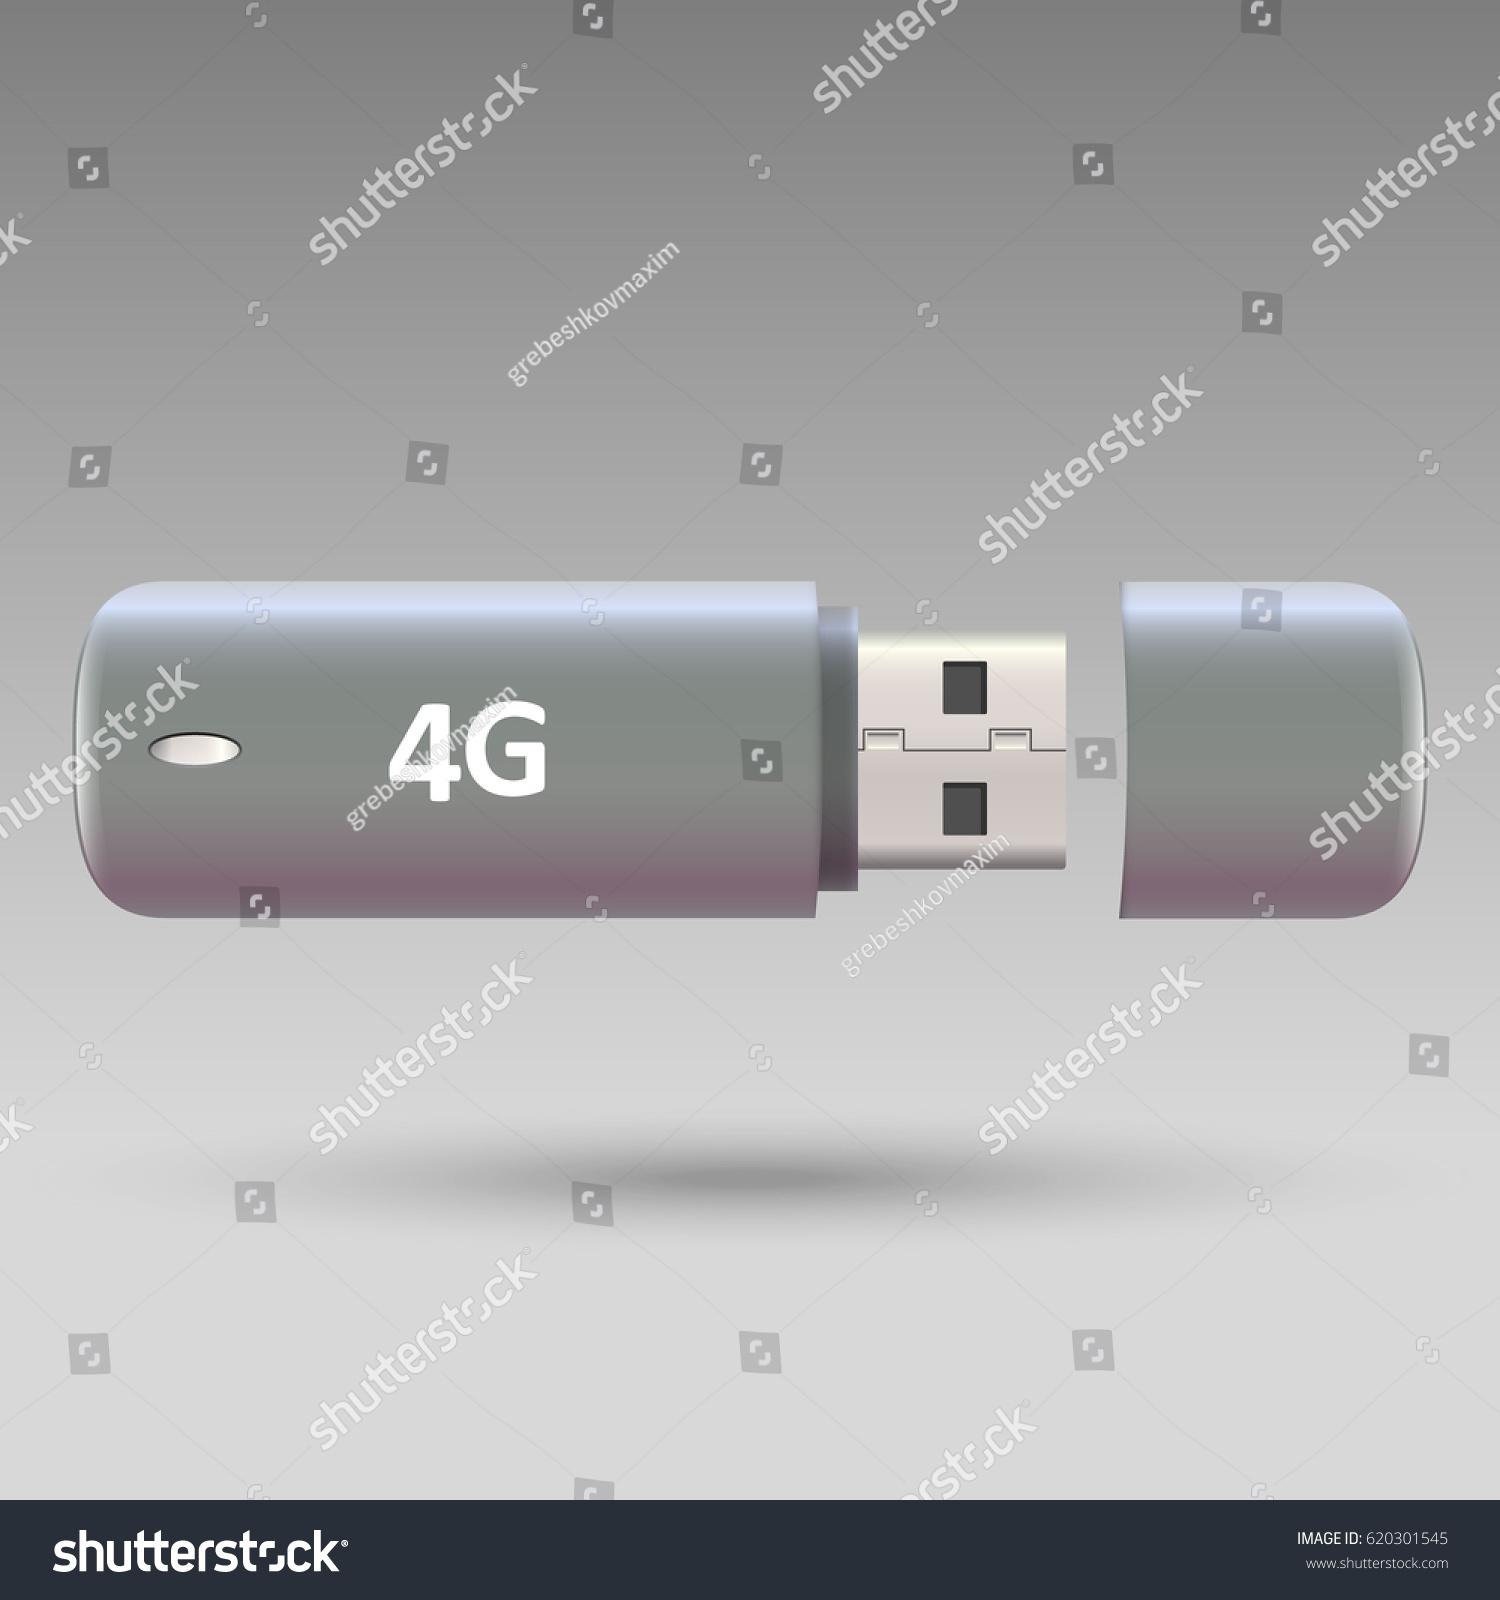 Usb Wireless Modem 4 G Portable Internet Stock Vector Royalty Free 4g Modemvector Illustration